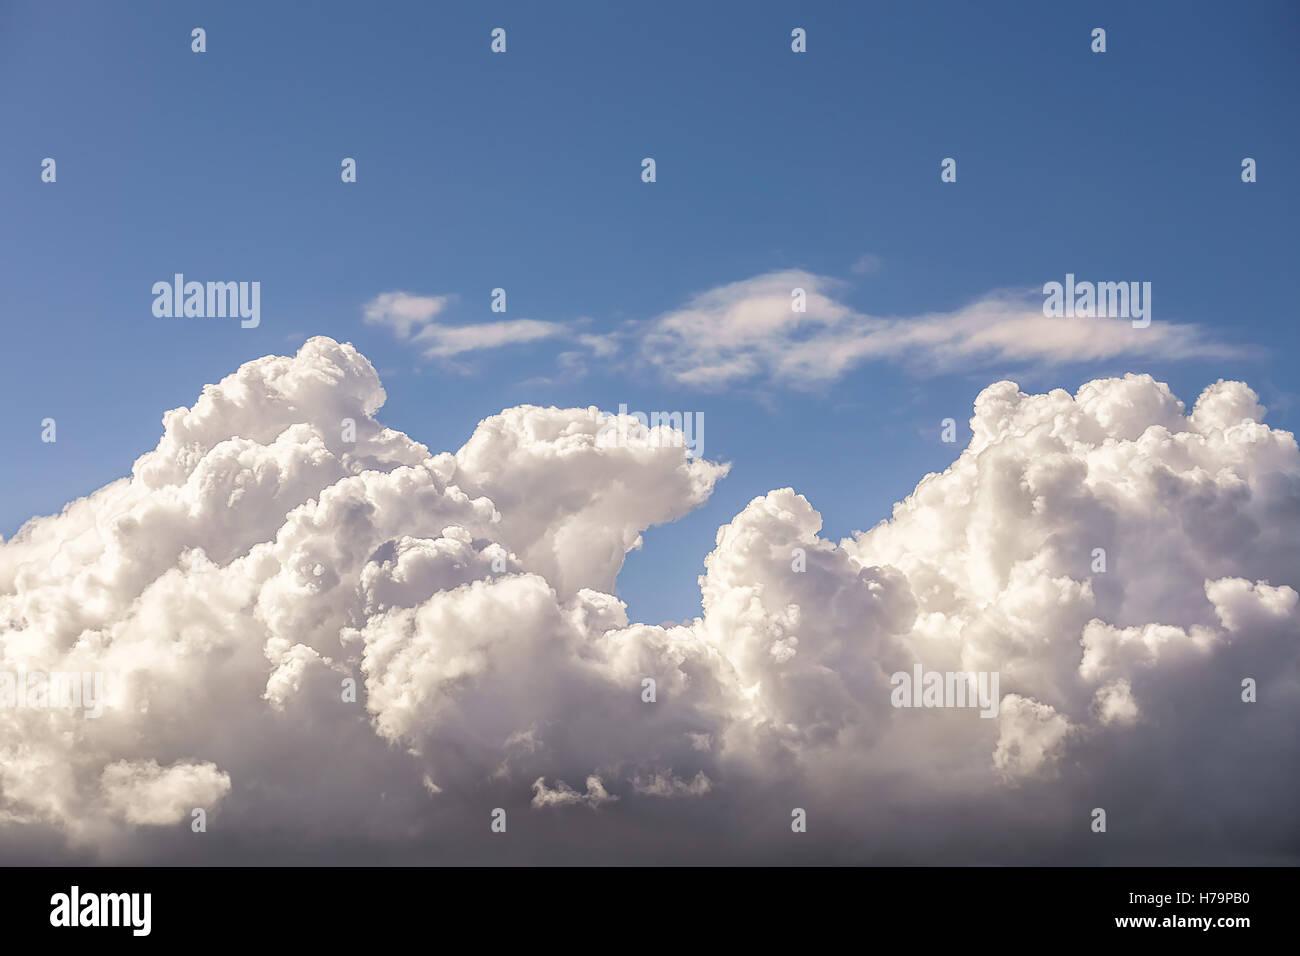 beautiful cloudscape with cumulonimbus clouds and blue sky - Stock Image